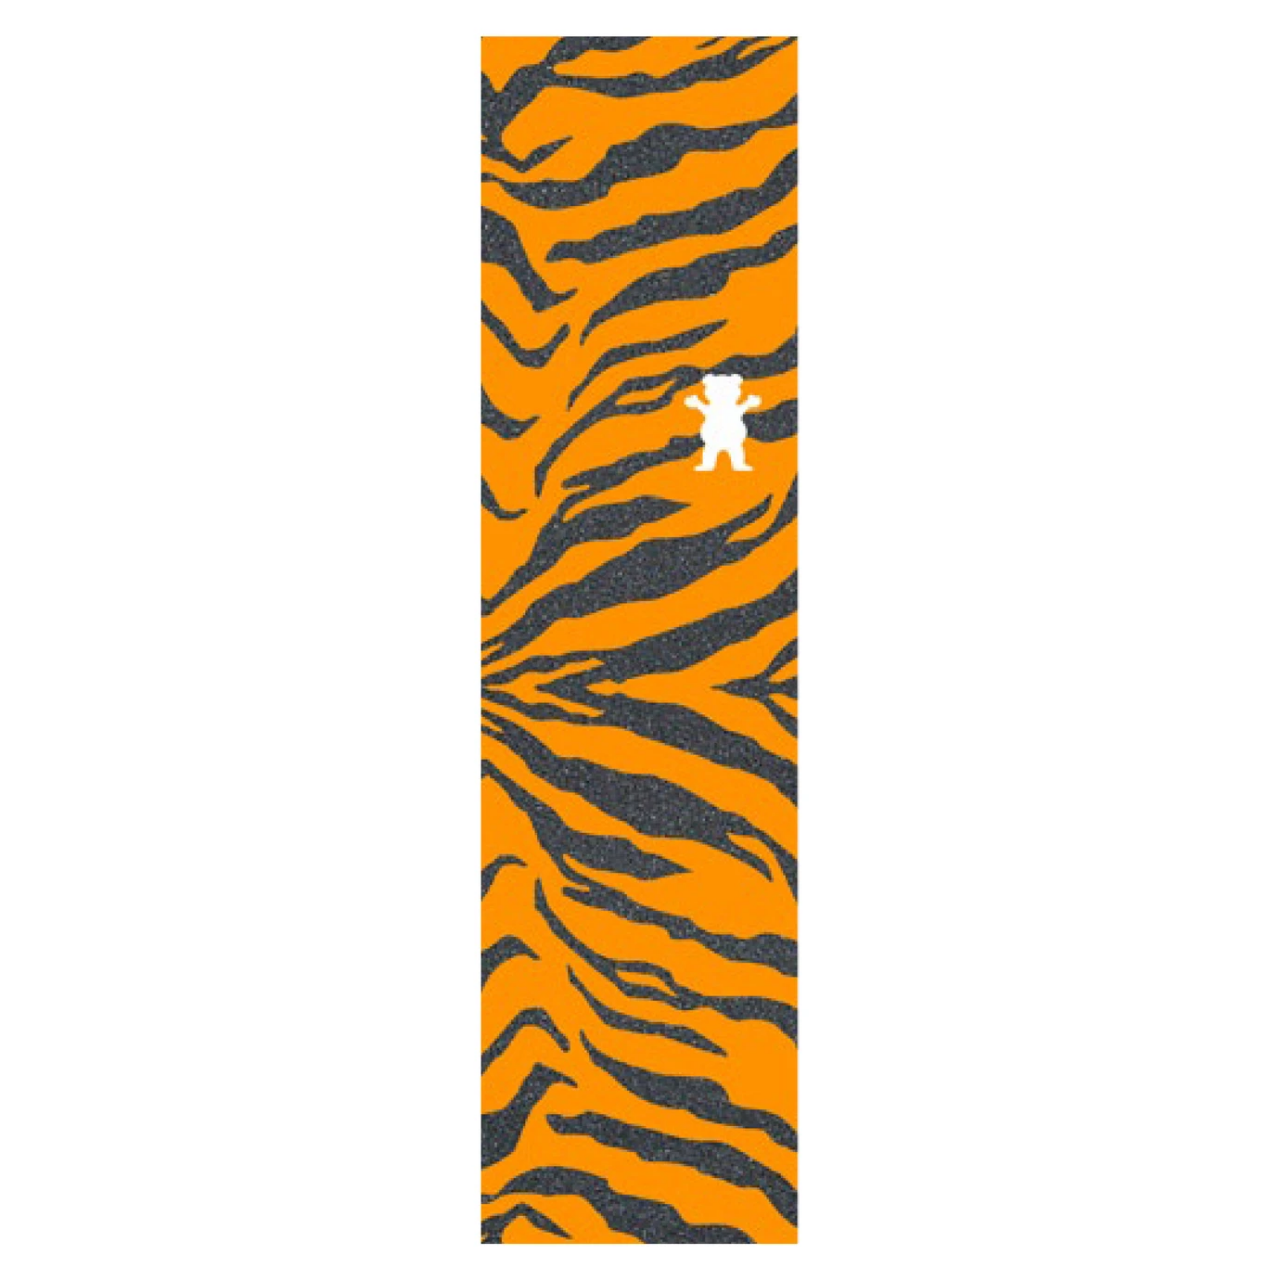 Grizzly Griptape Tiger King OG Bear Griptape